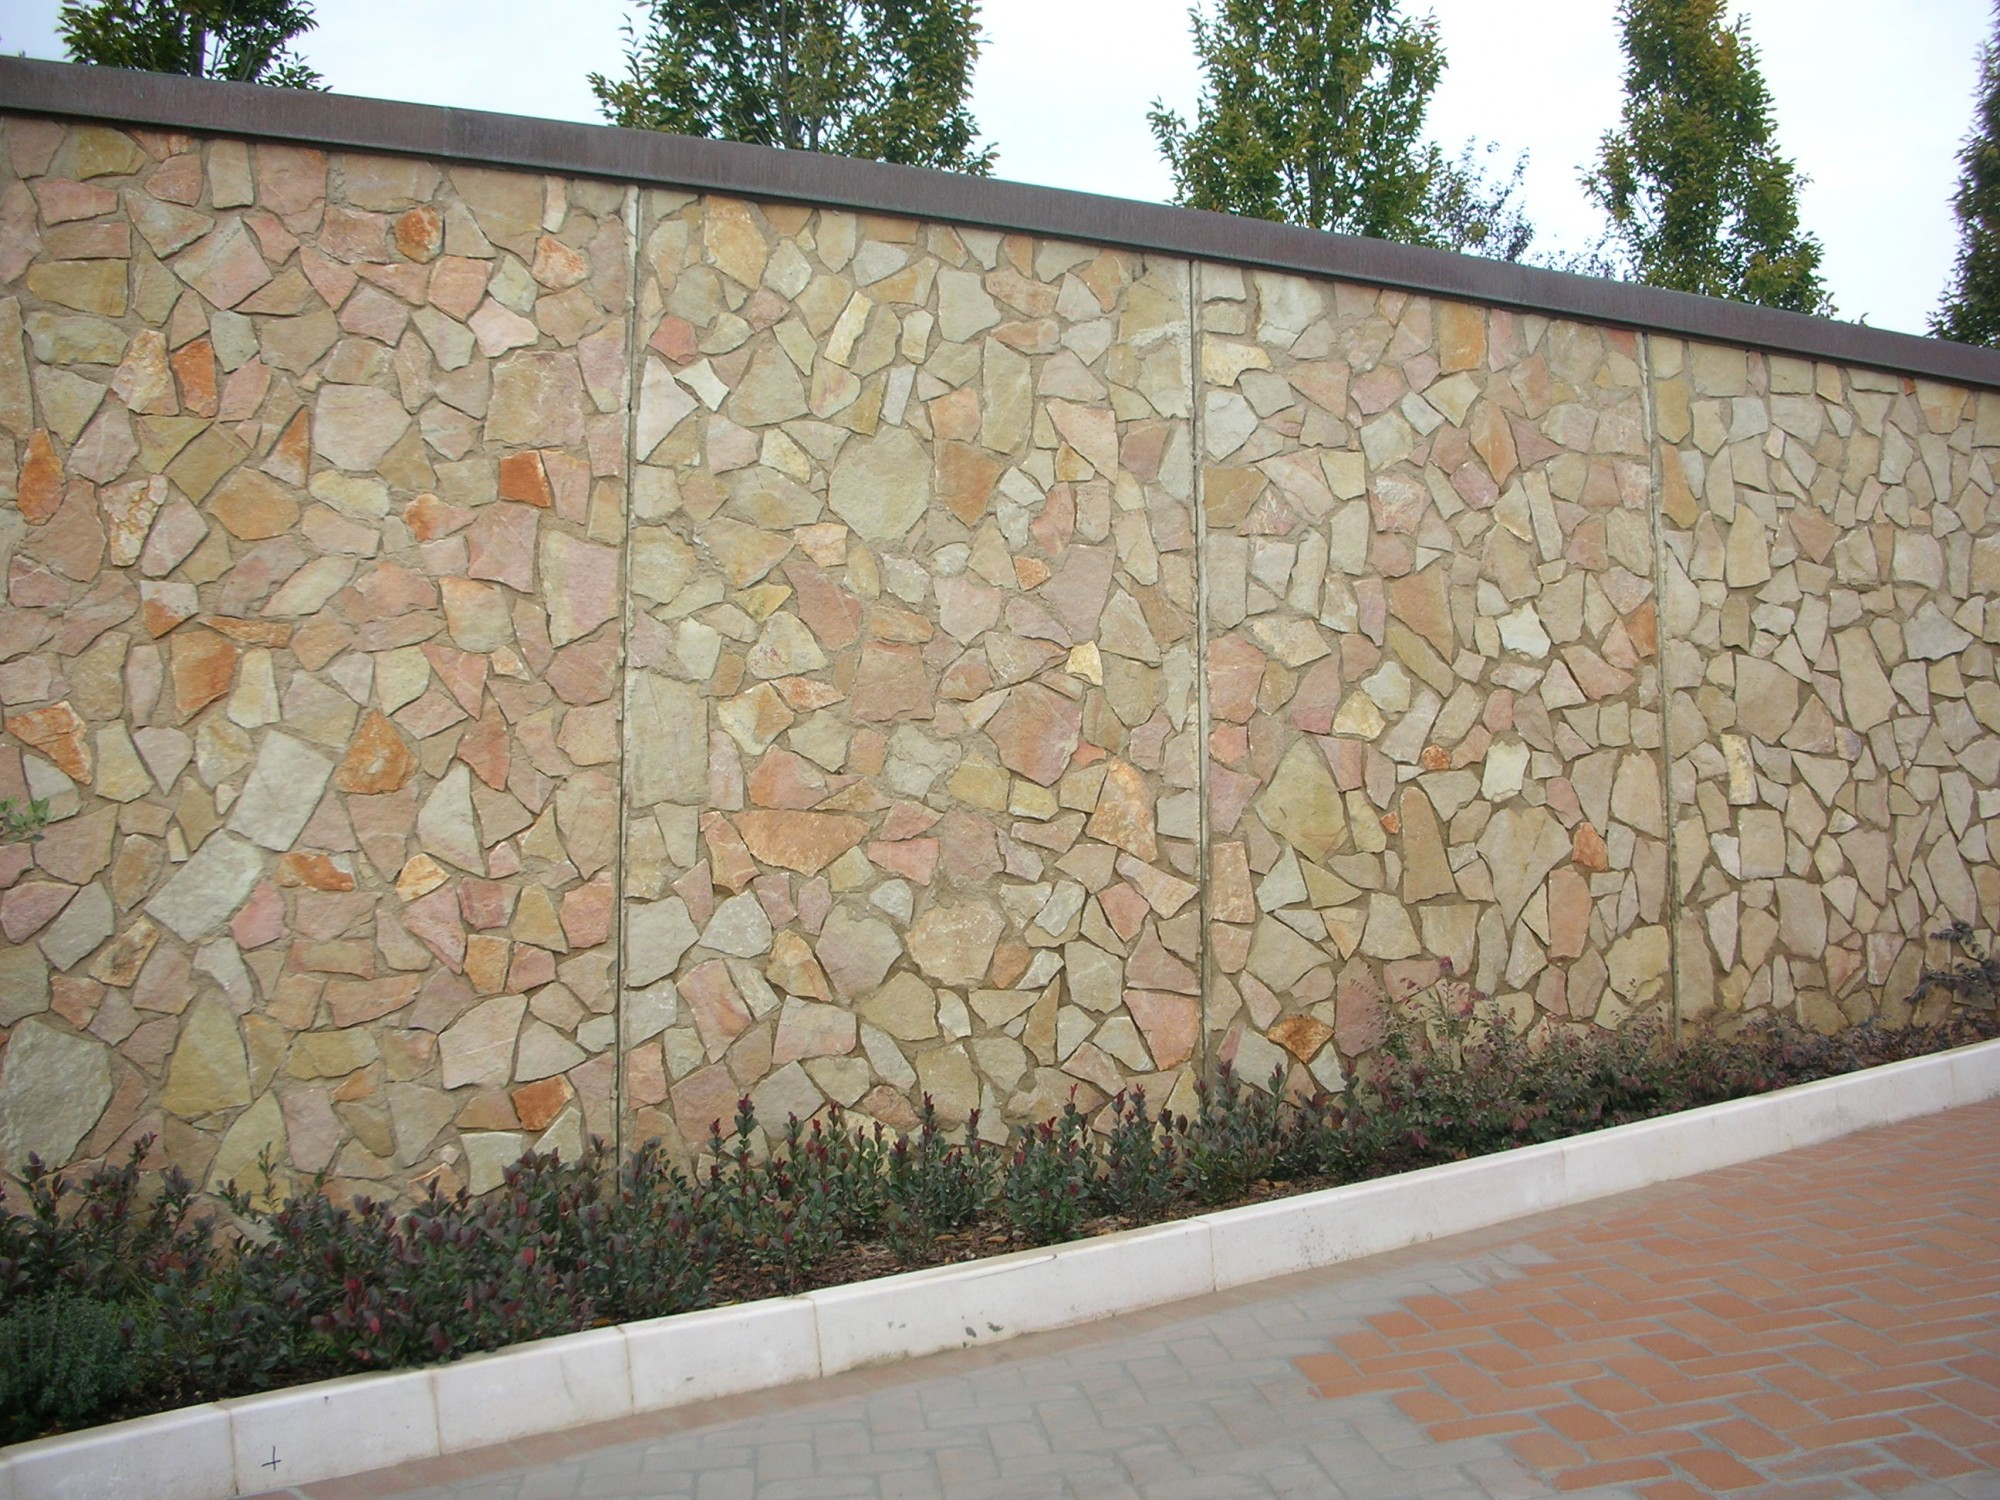 Primavera Prefabbricati Muri Prefabbricati Monolastra Con Rivestimento